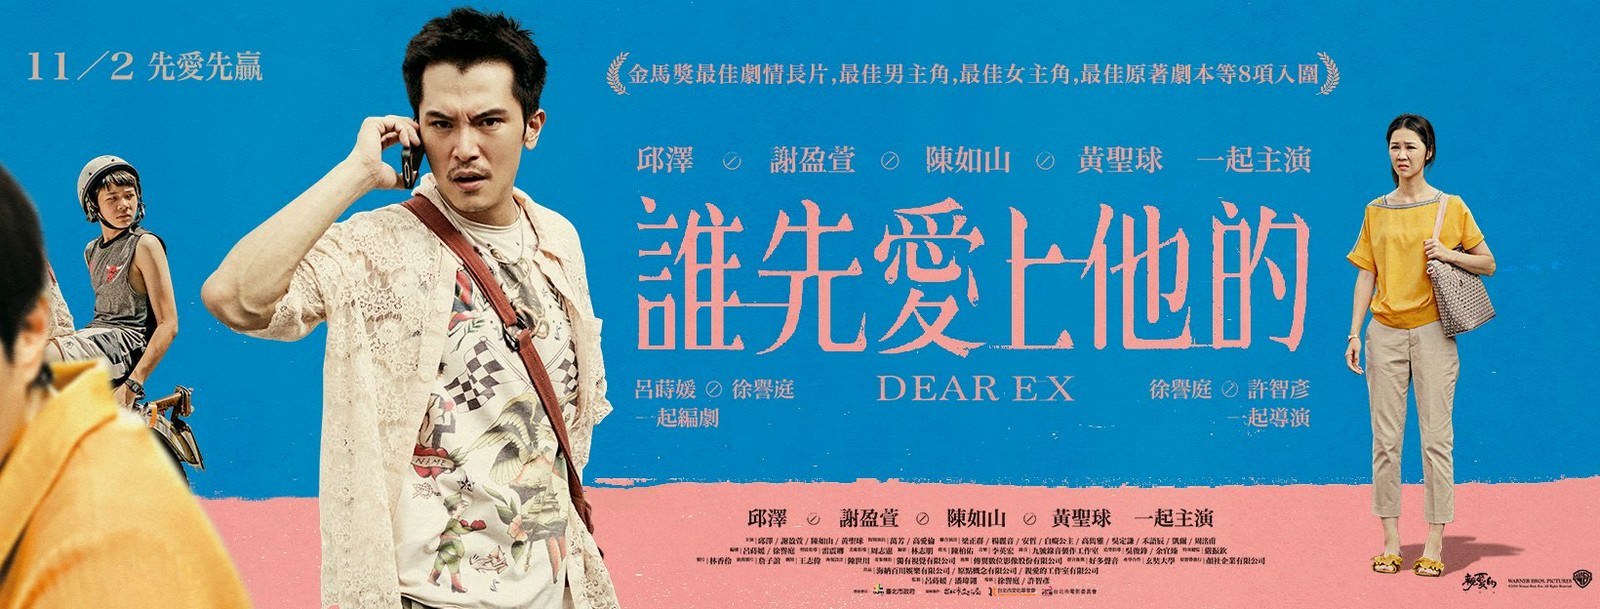 Movie, 誰先愛上他的(台灣, 2018年) / Dear EX(英文), 電影海報, 台灣, 橫版